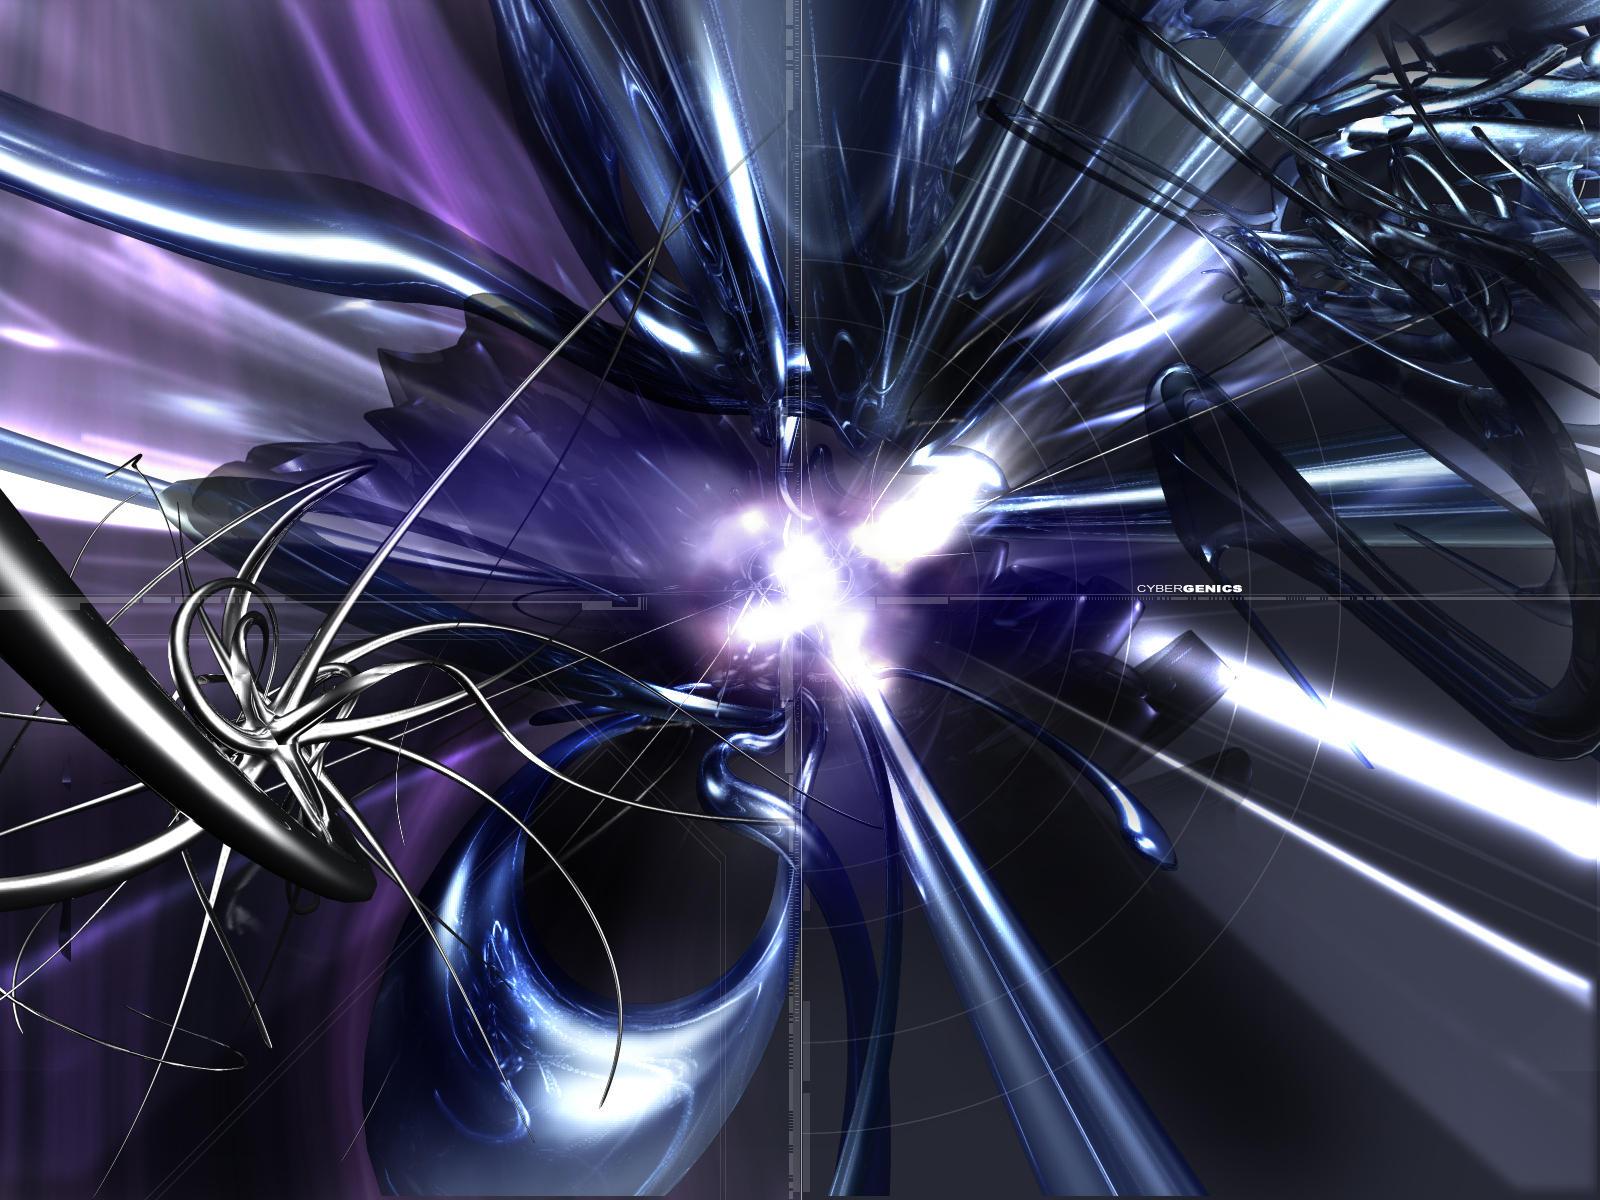 VIRRUUSSS by cybergenics